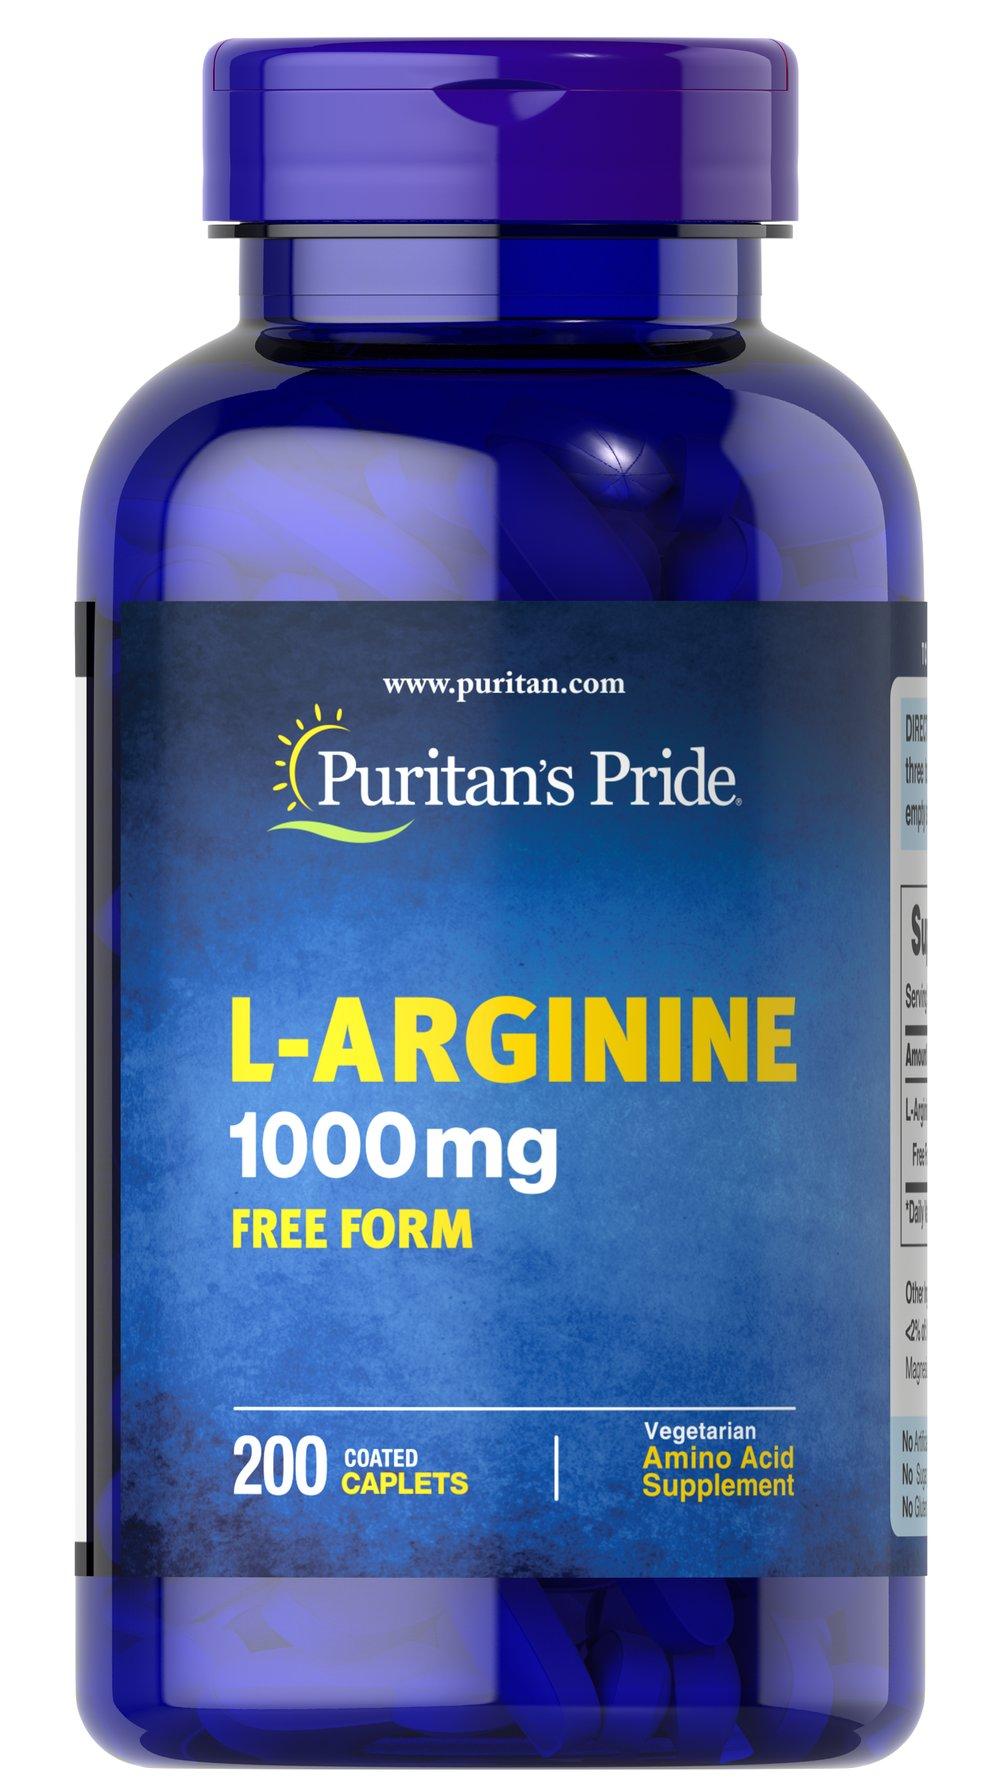 L-Arginine 1000mg com Aminoacido Puritan - Pride - 200 Capsulas